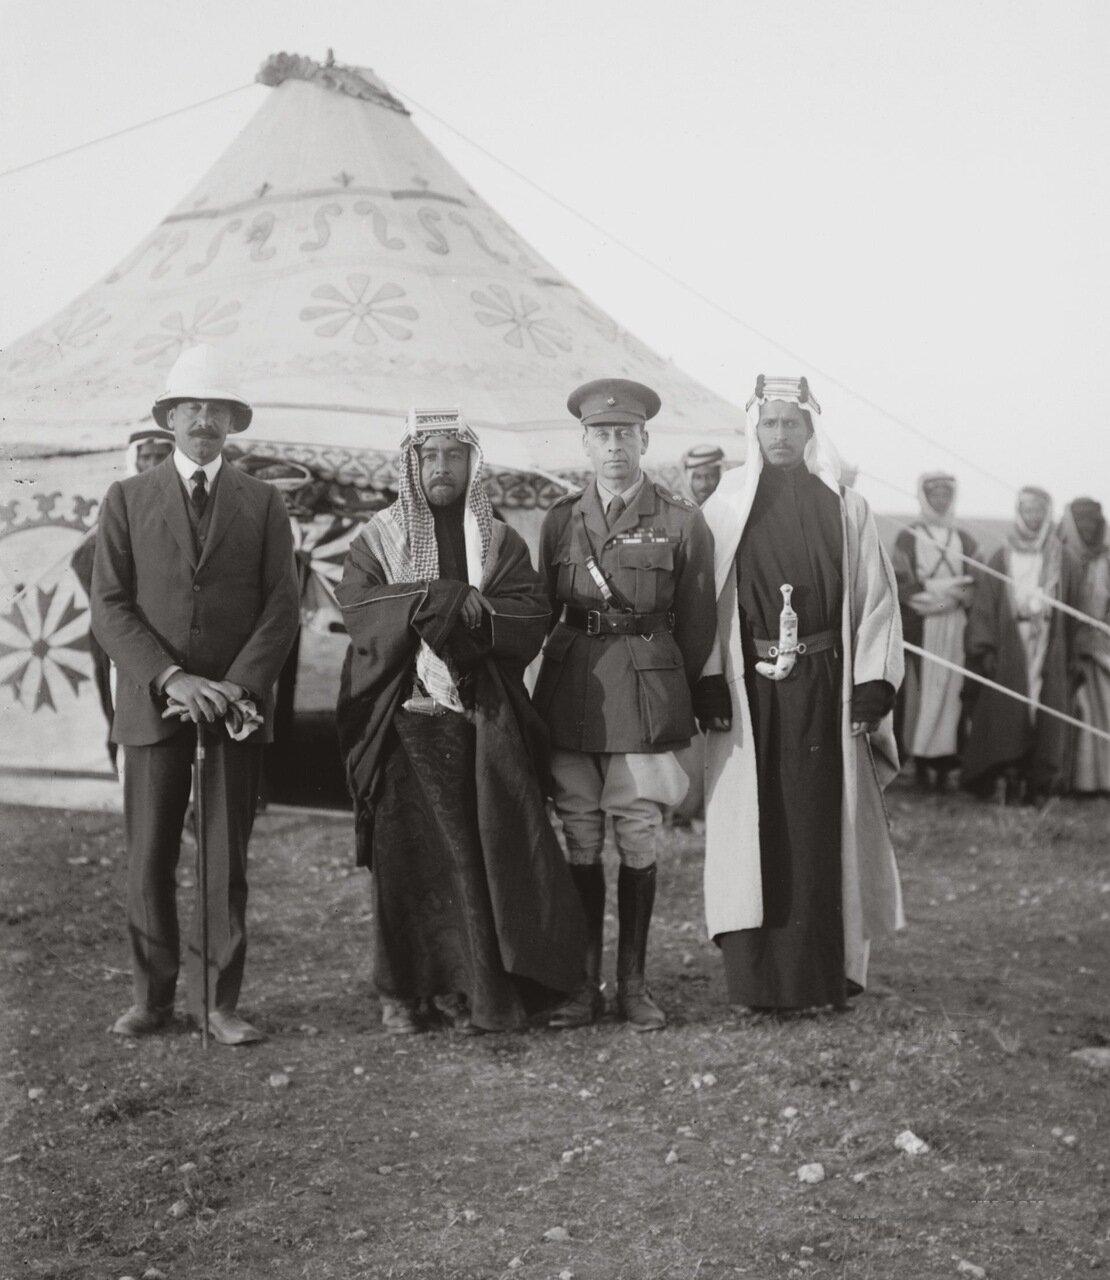 Сэр Герберт Самуэль, эмир Абдулла, сэр Виндам Дидс. Трансиордания. 18 апреля 1921 г.